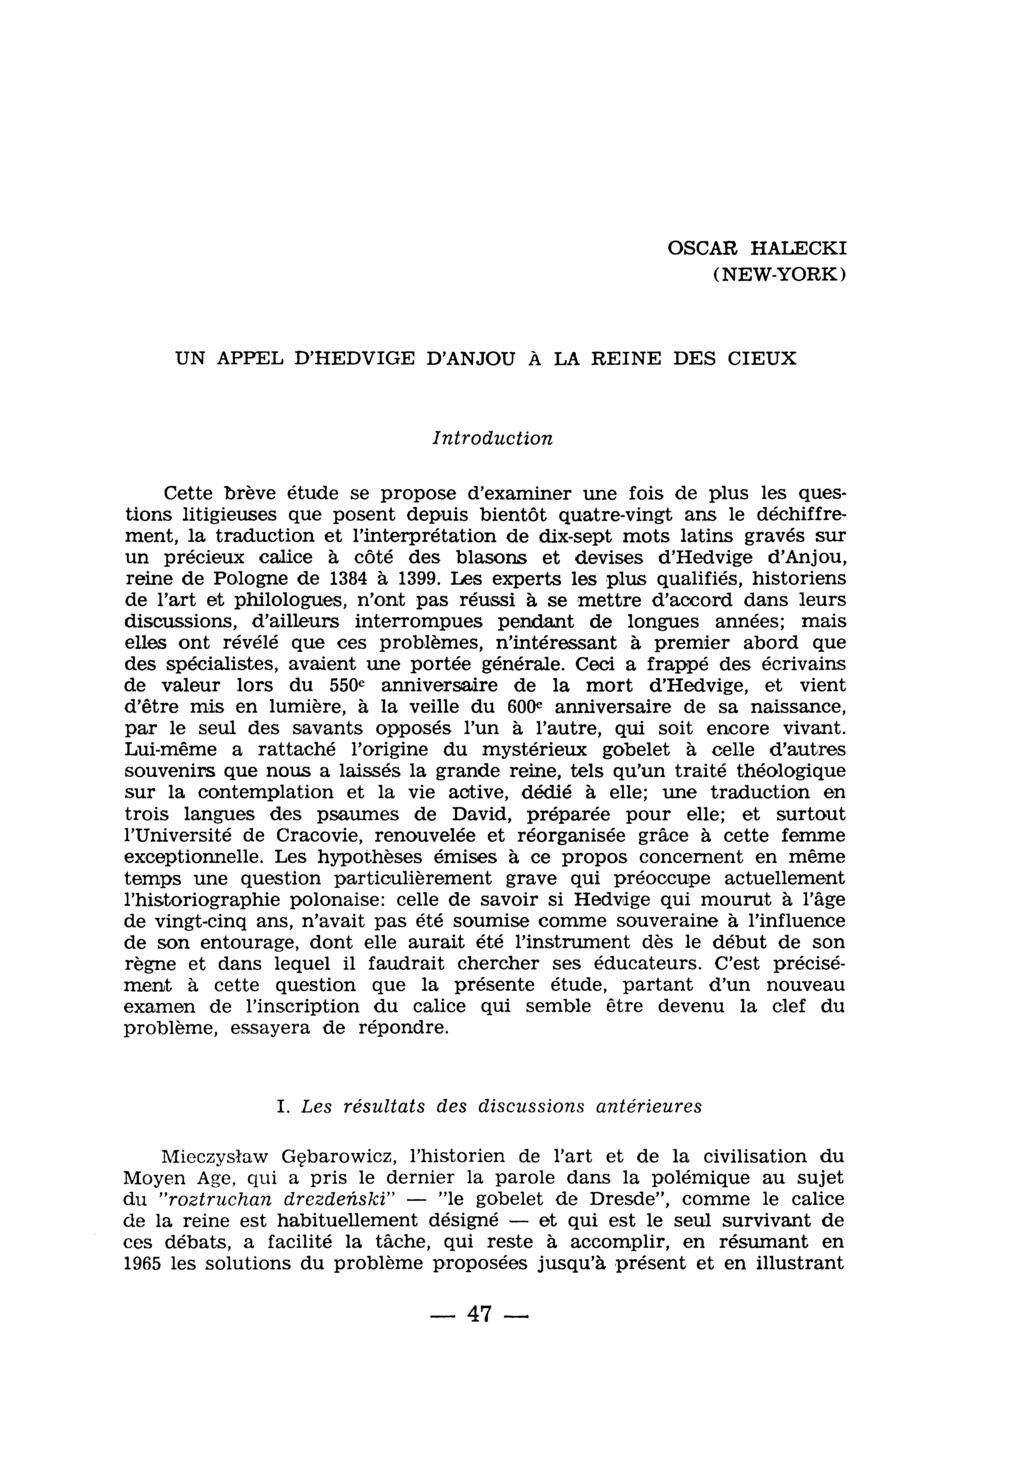 Violation De Domicile Jardin Nouveau Institutum Historicum Polonicum Roma E Antemurale Non Of 59 Best Of Violation De Domicile Jardin